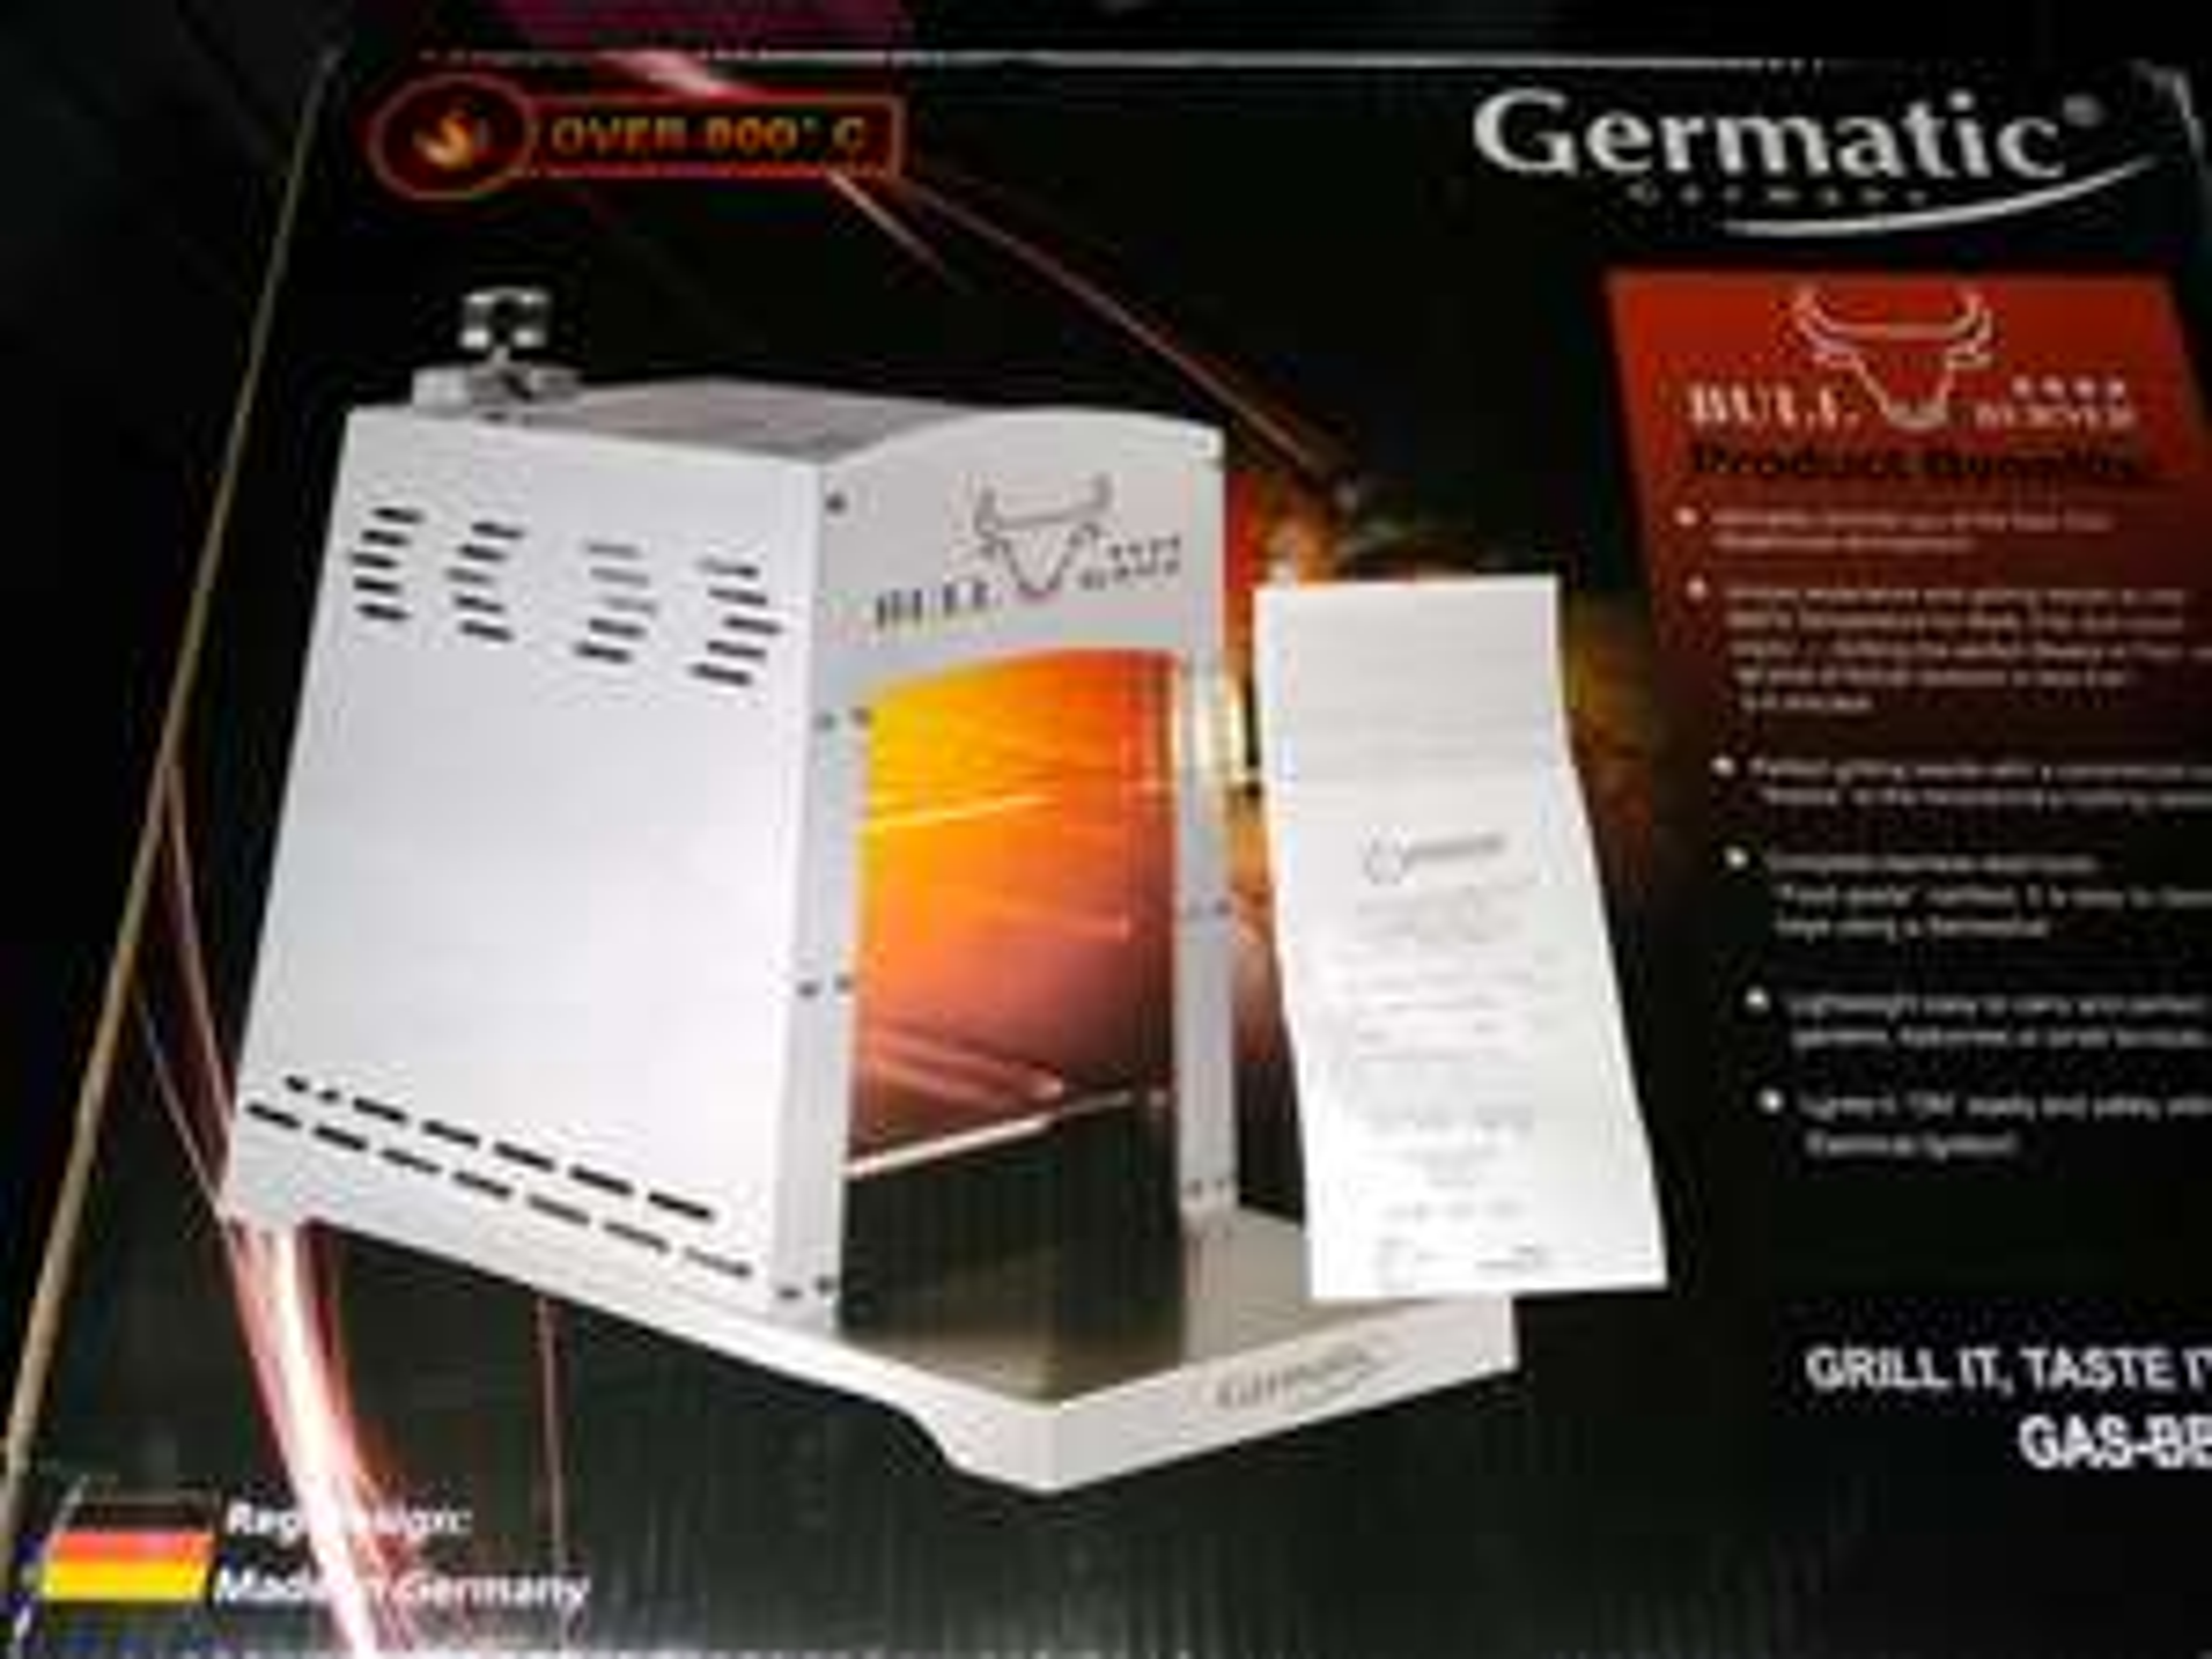 Gasgrill Germatic Bull Burner steakgrill @poco rheda wiedenbrück lokal..eventuell bundesweit